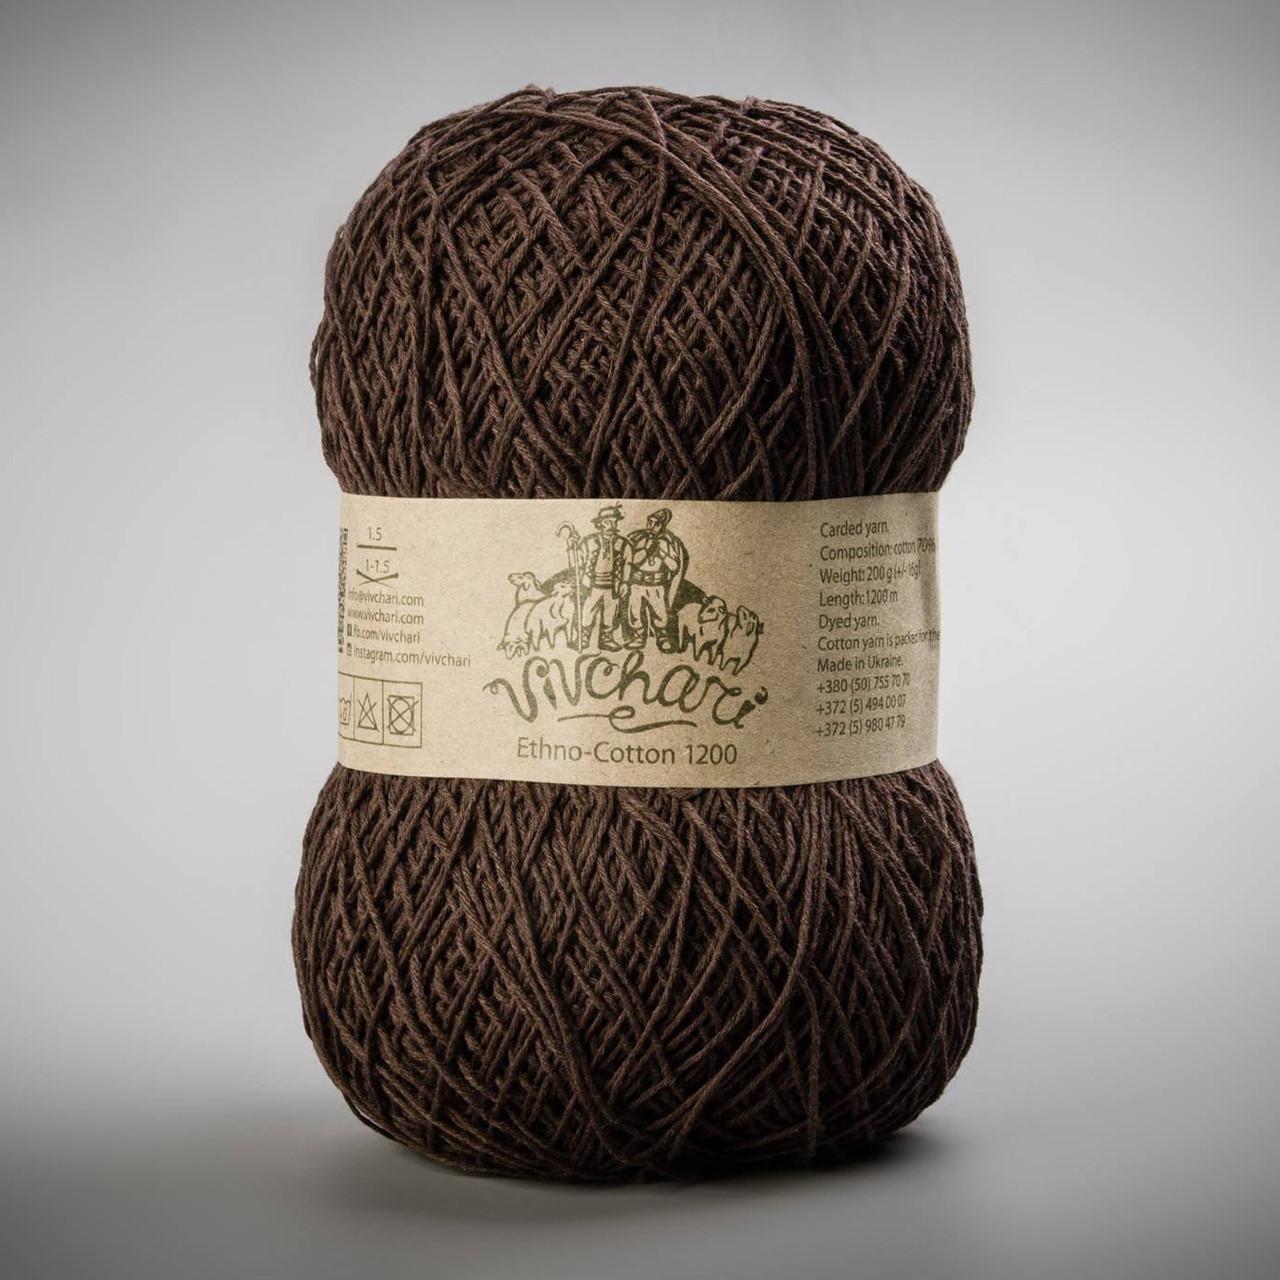 Vivchari Ethno-Cotton 1200, цвет 025 шоколад